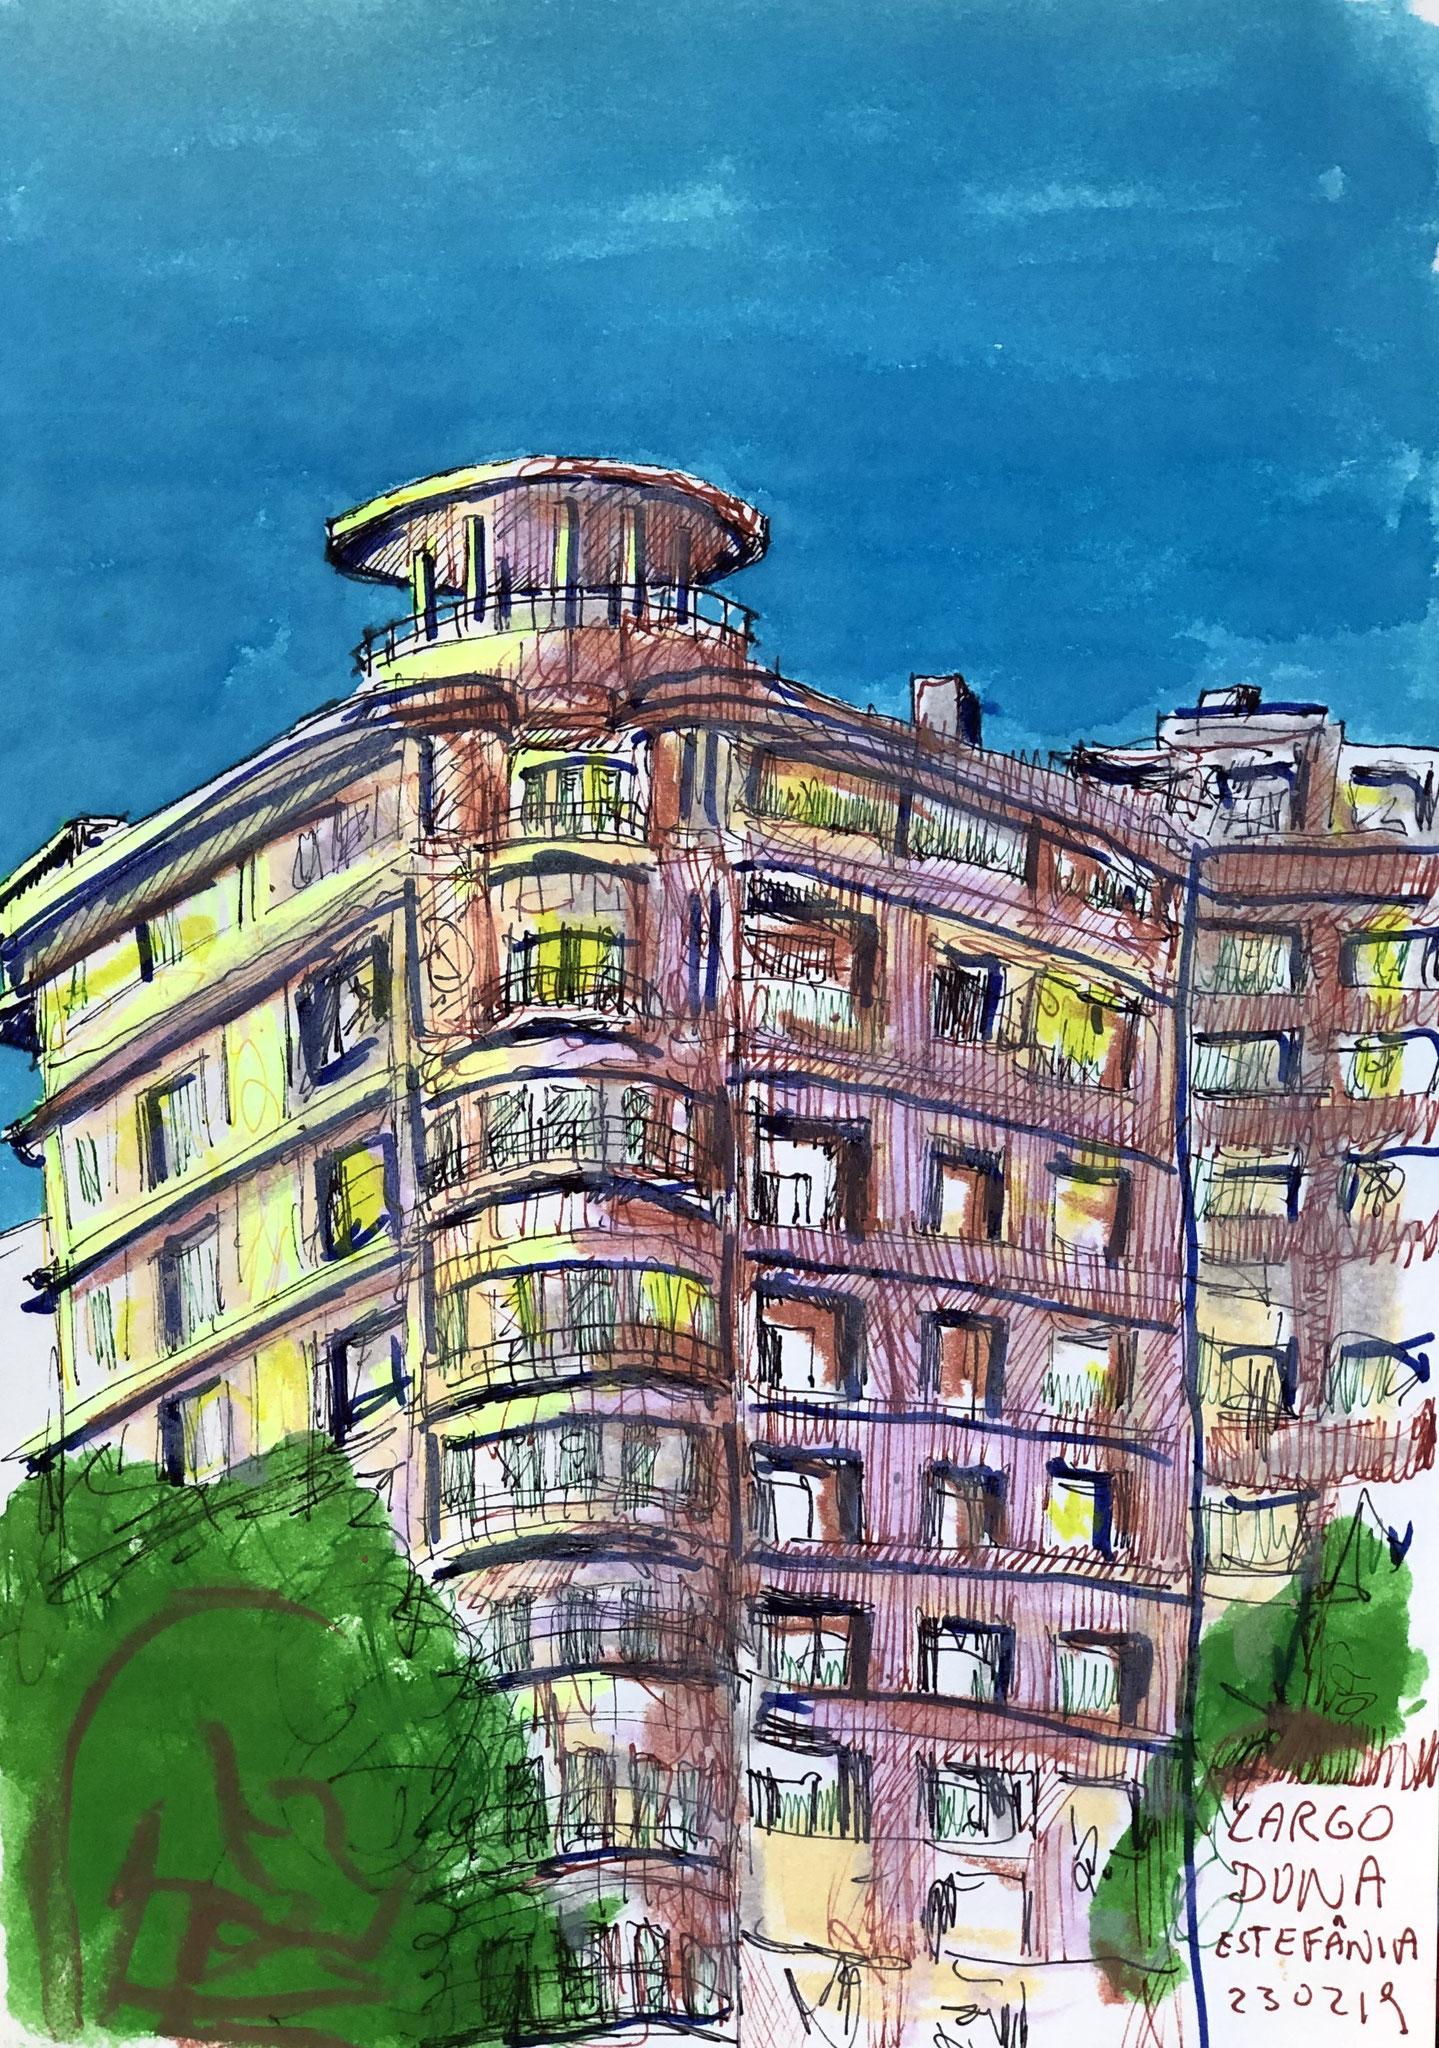 aus meinem Skizzenbuch: LISBOA, LARGO DONA ESTEFANIA     Mischtechnik auf Papier - 28 x 20cm